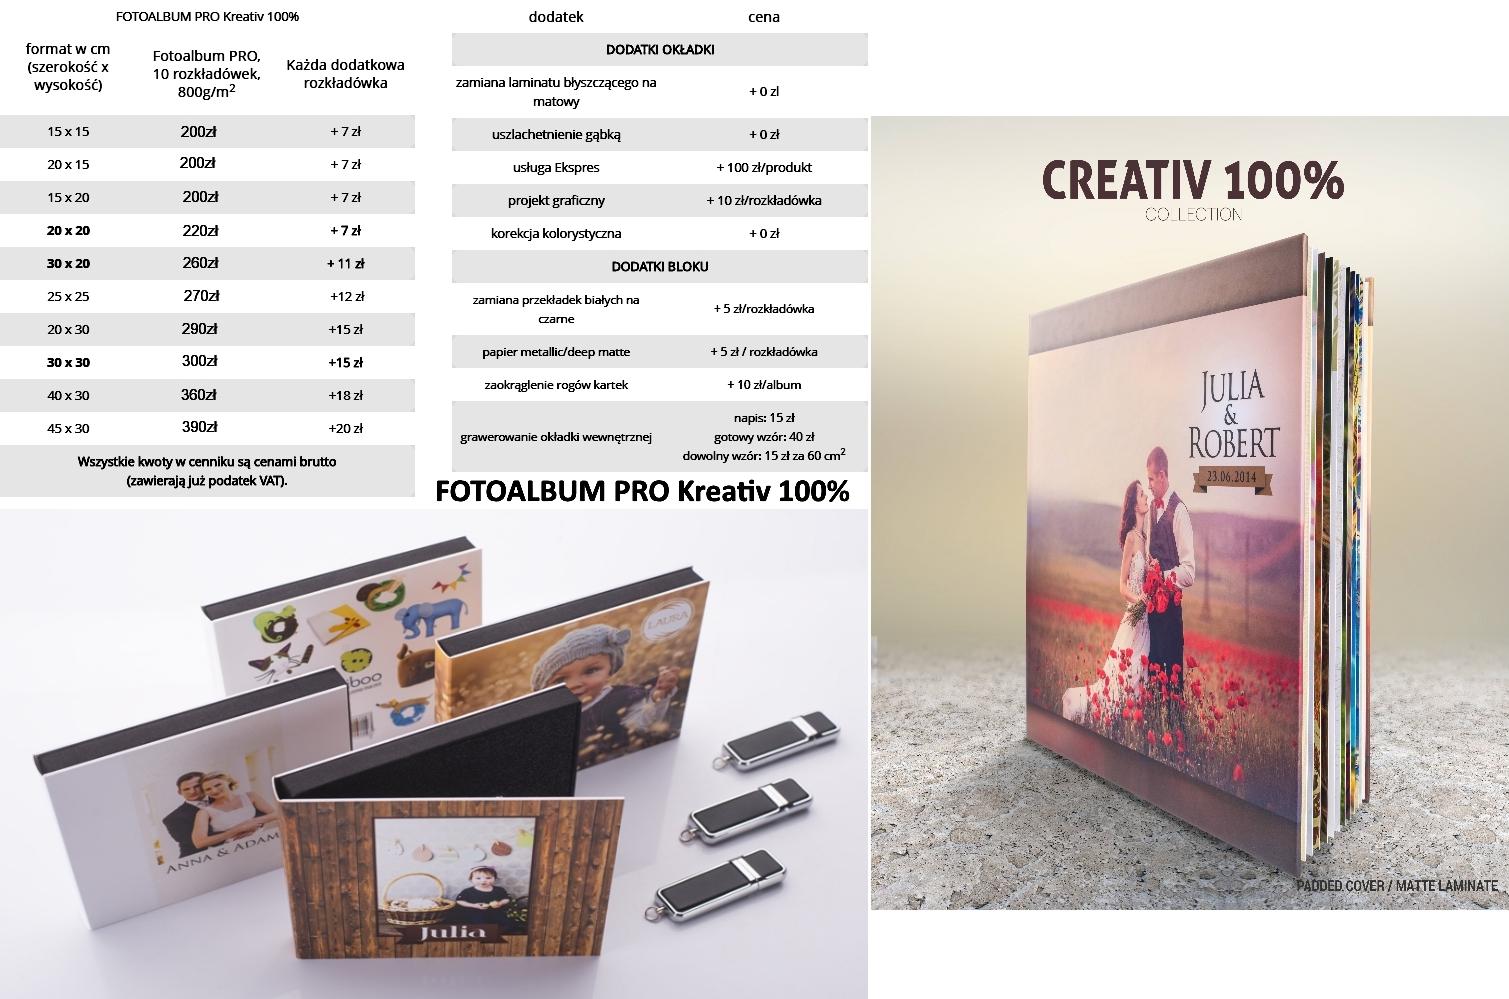 FOTOALBUM PRO Kreativ 100%